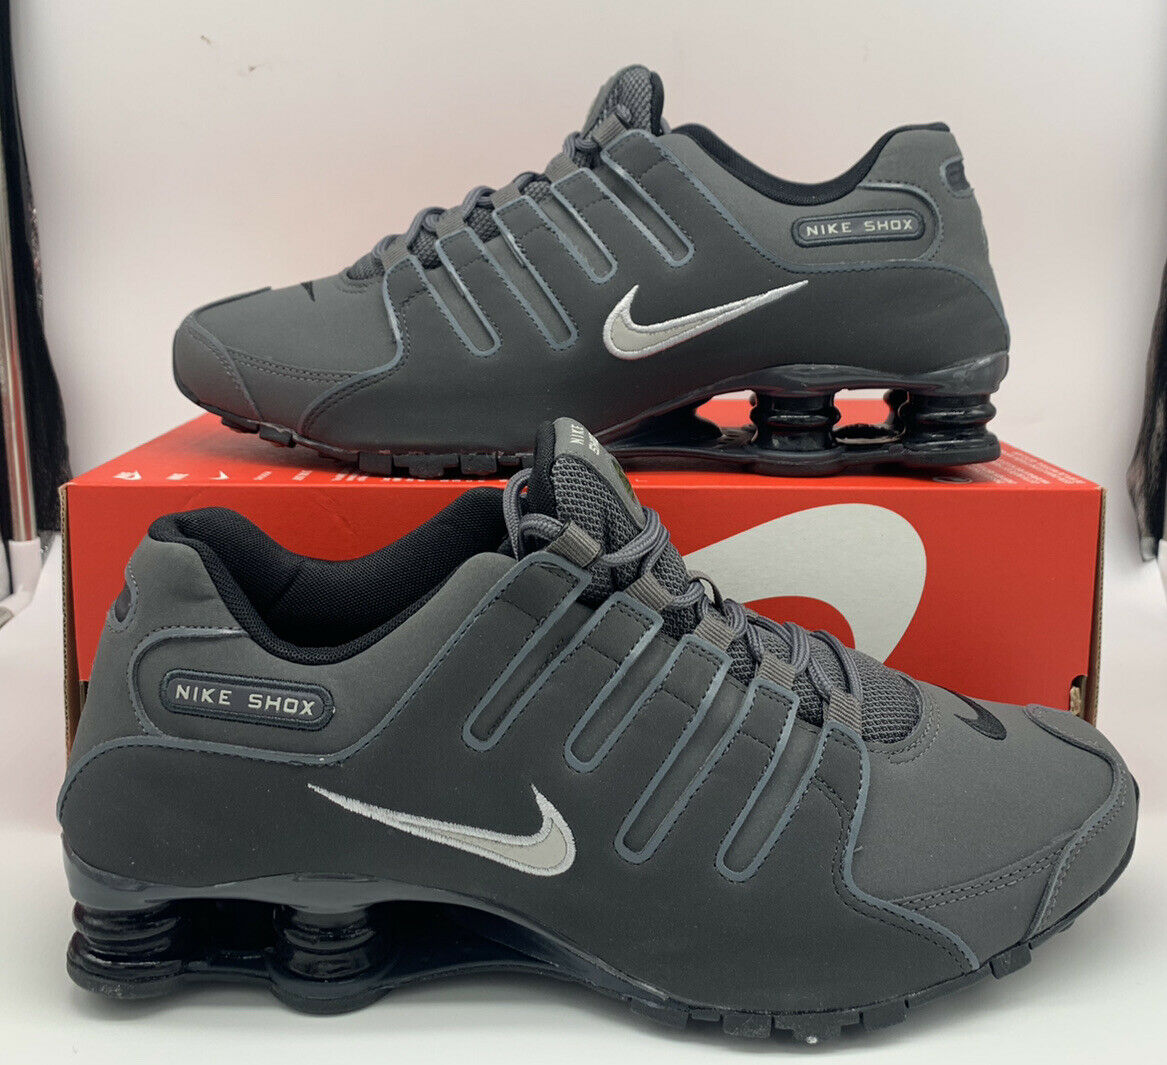 Nike Shox NZ Men's Shoes 378341-059 Dark Grey Anthracite Metallic